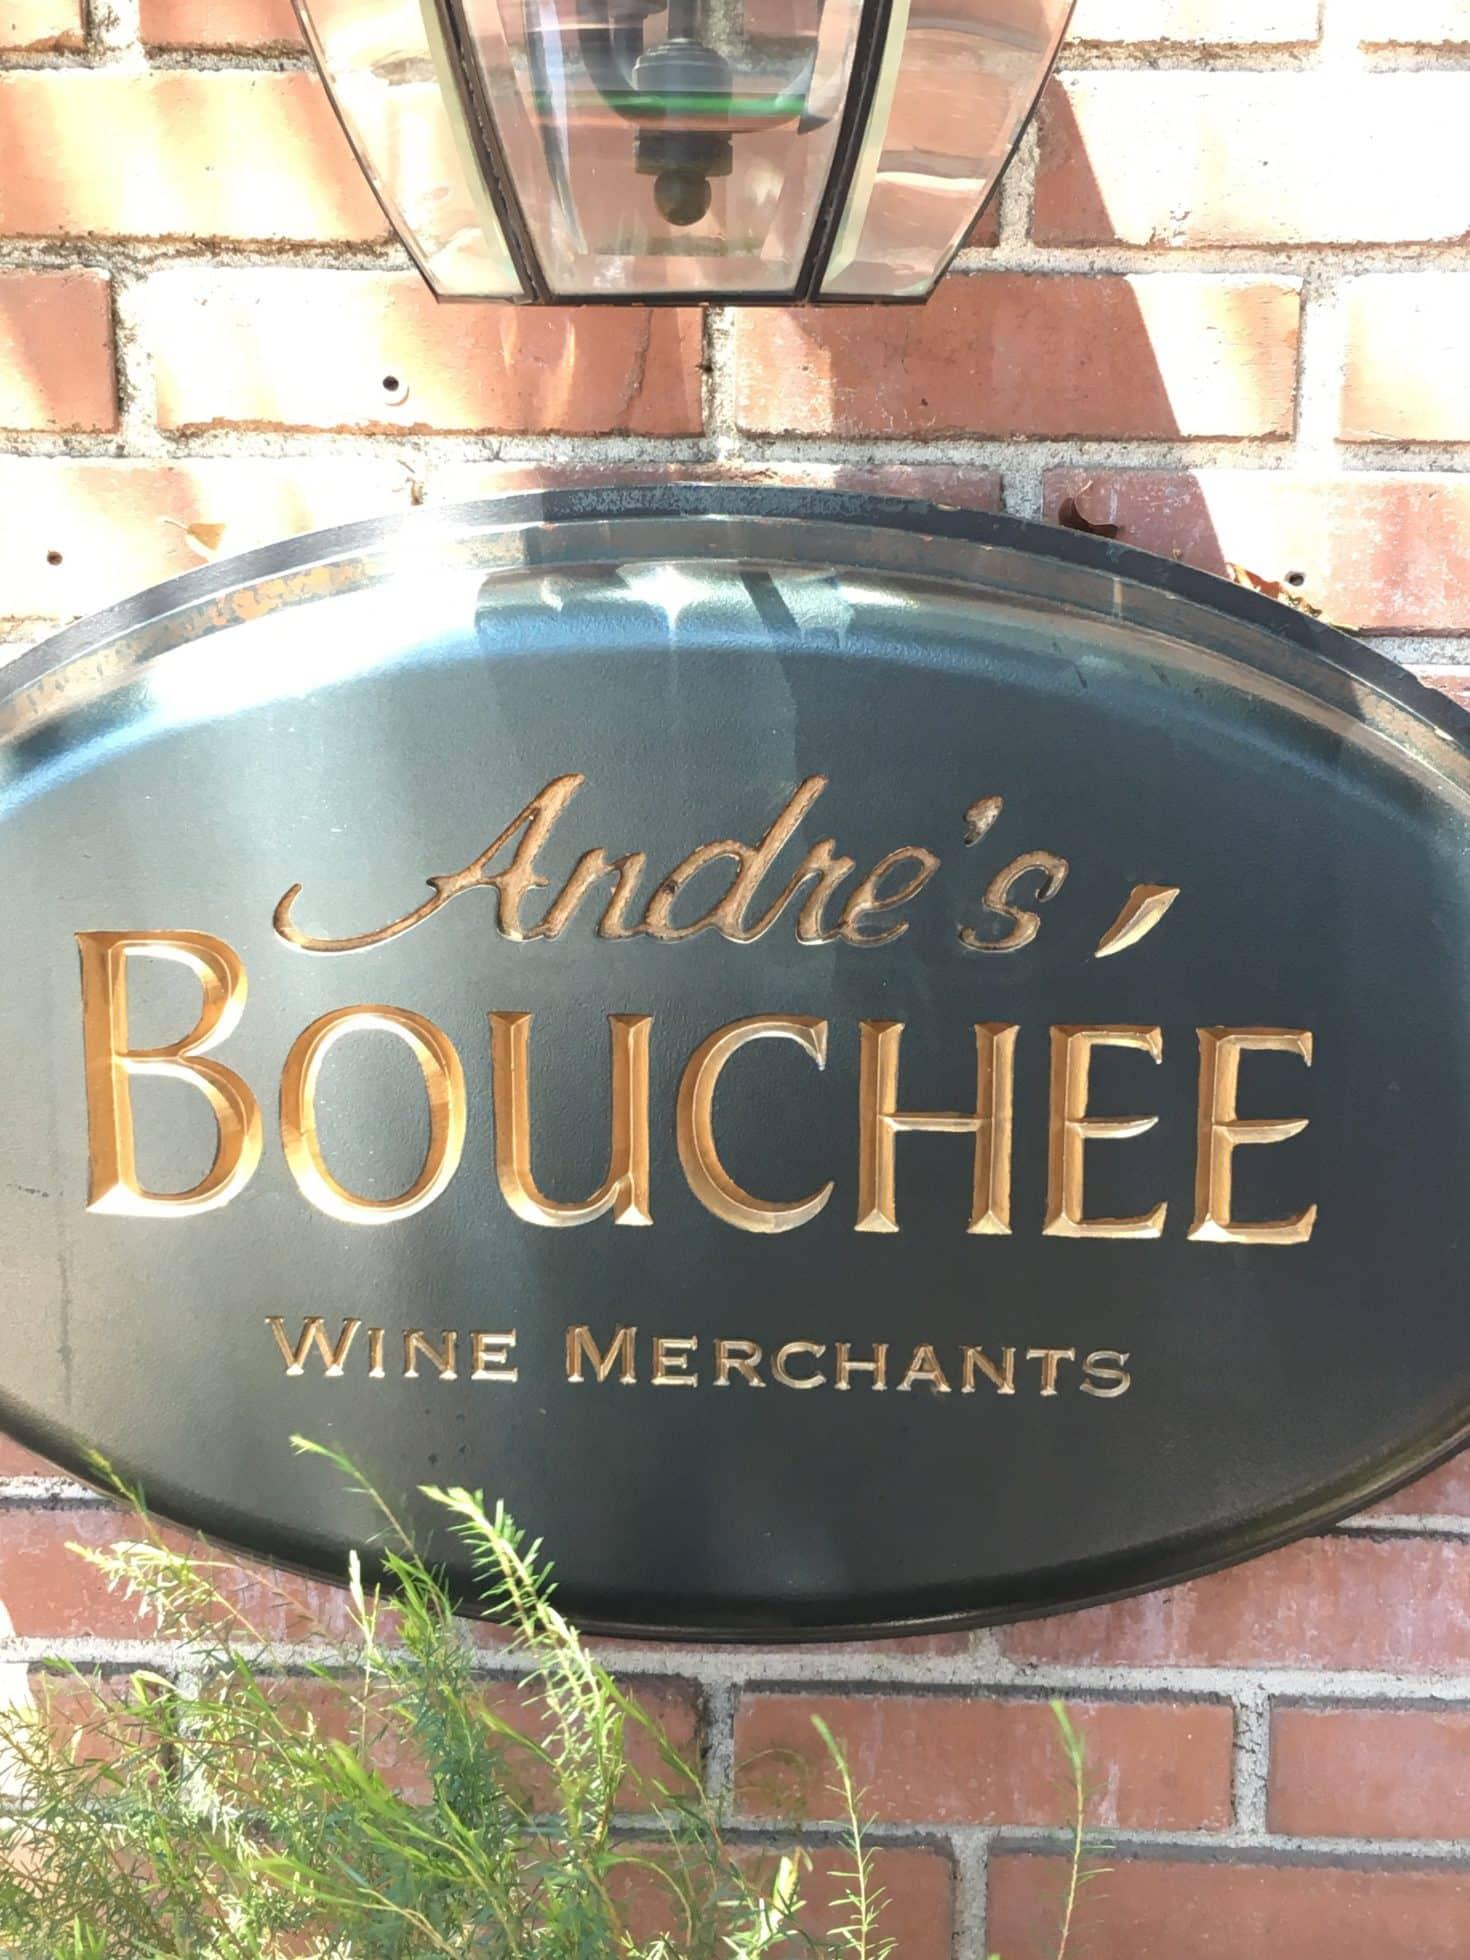 Andres Bouchee Wine Merchants Carmel